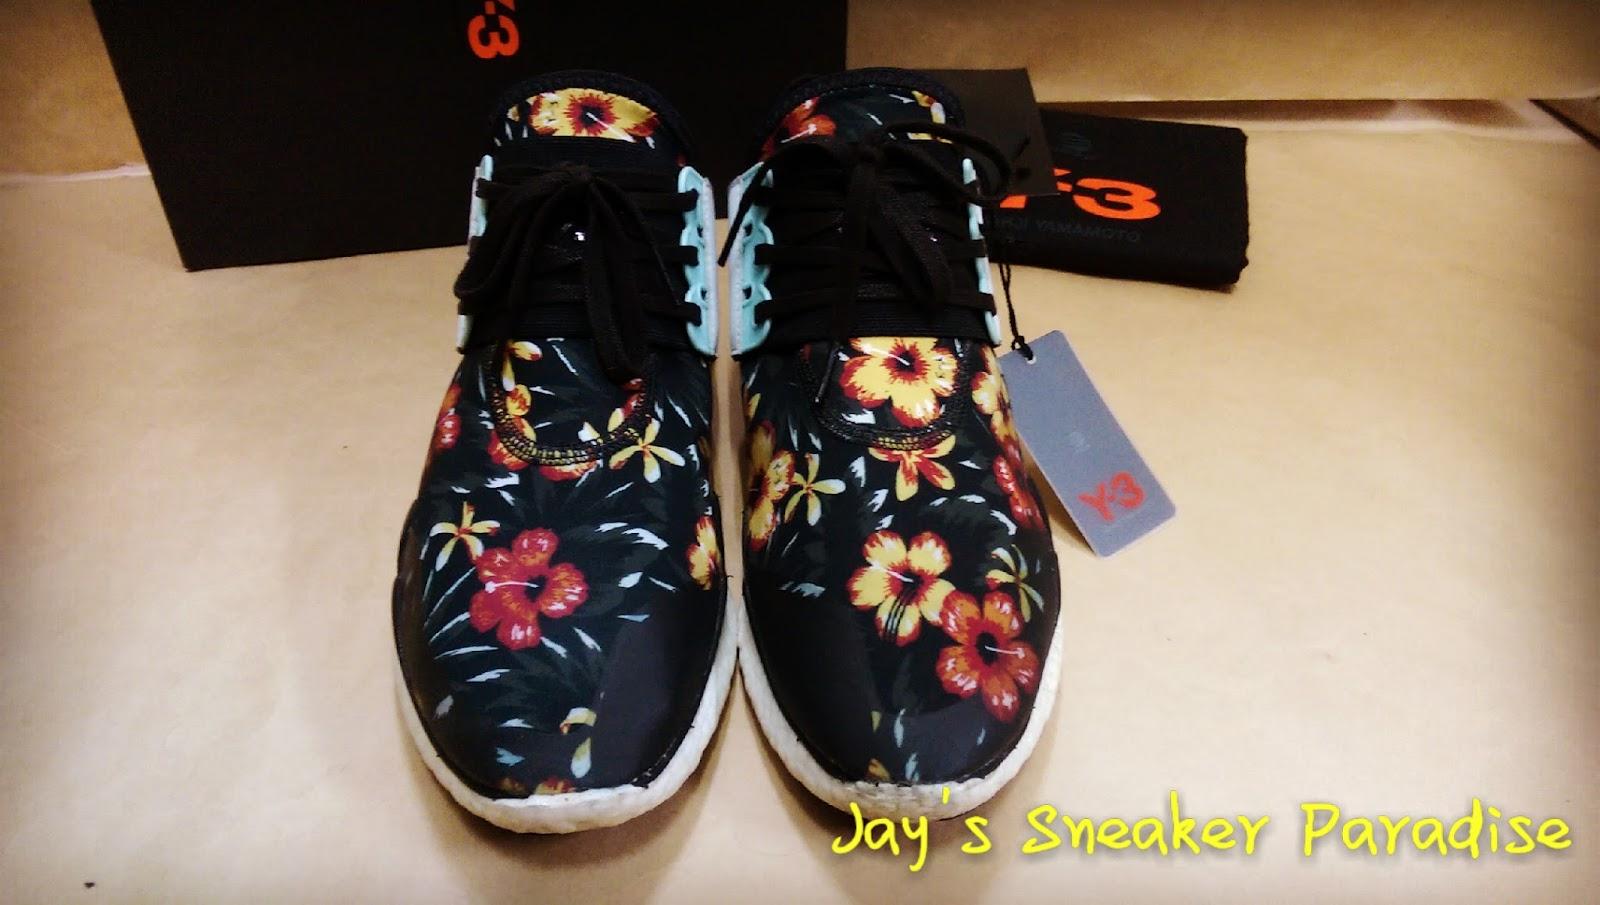 3cf7dc9f67d60 改成採用大量的花卉當作鞋面,隨機花紋使雙雙皆不同款. 就算路上撞鞋也不怕!太神啦~